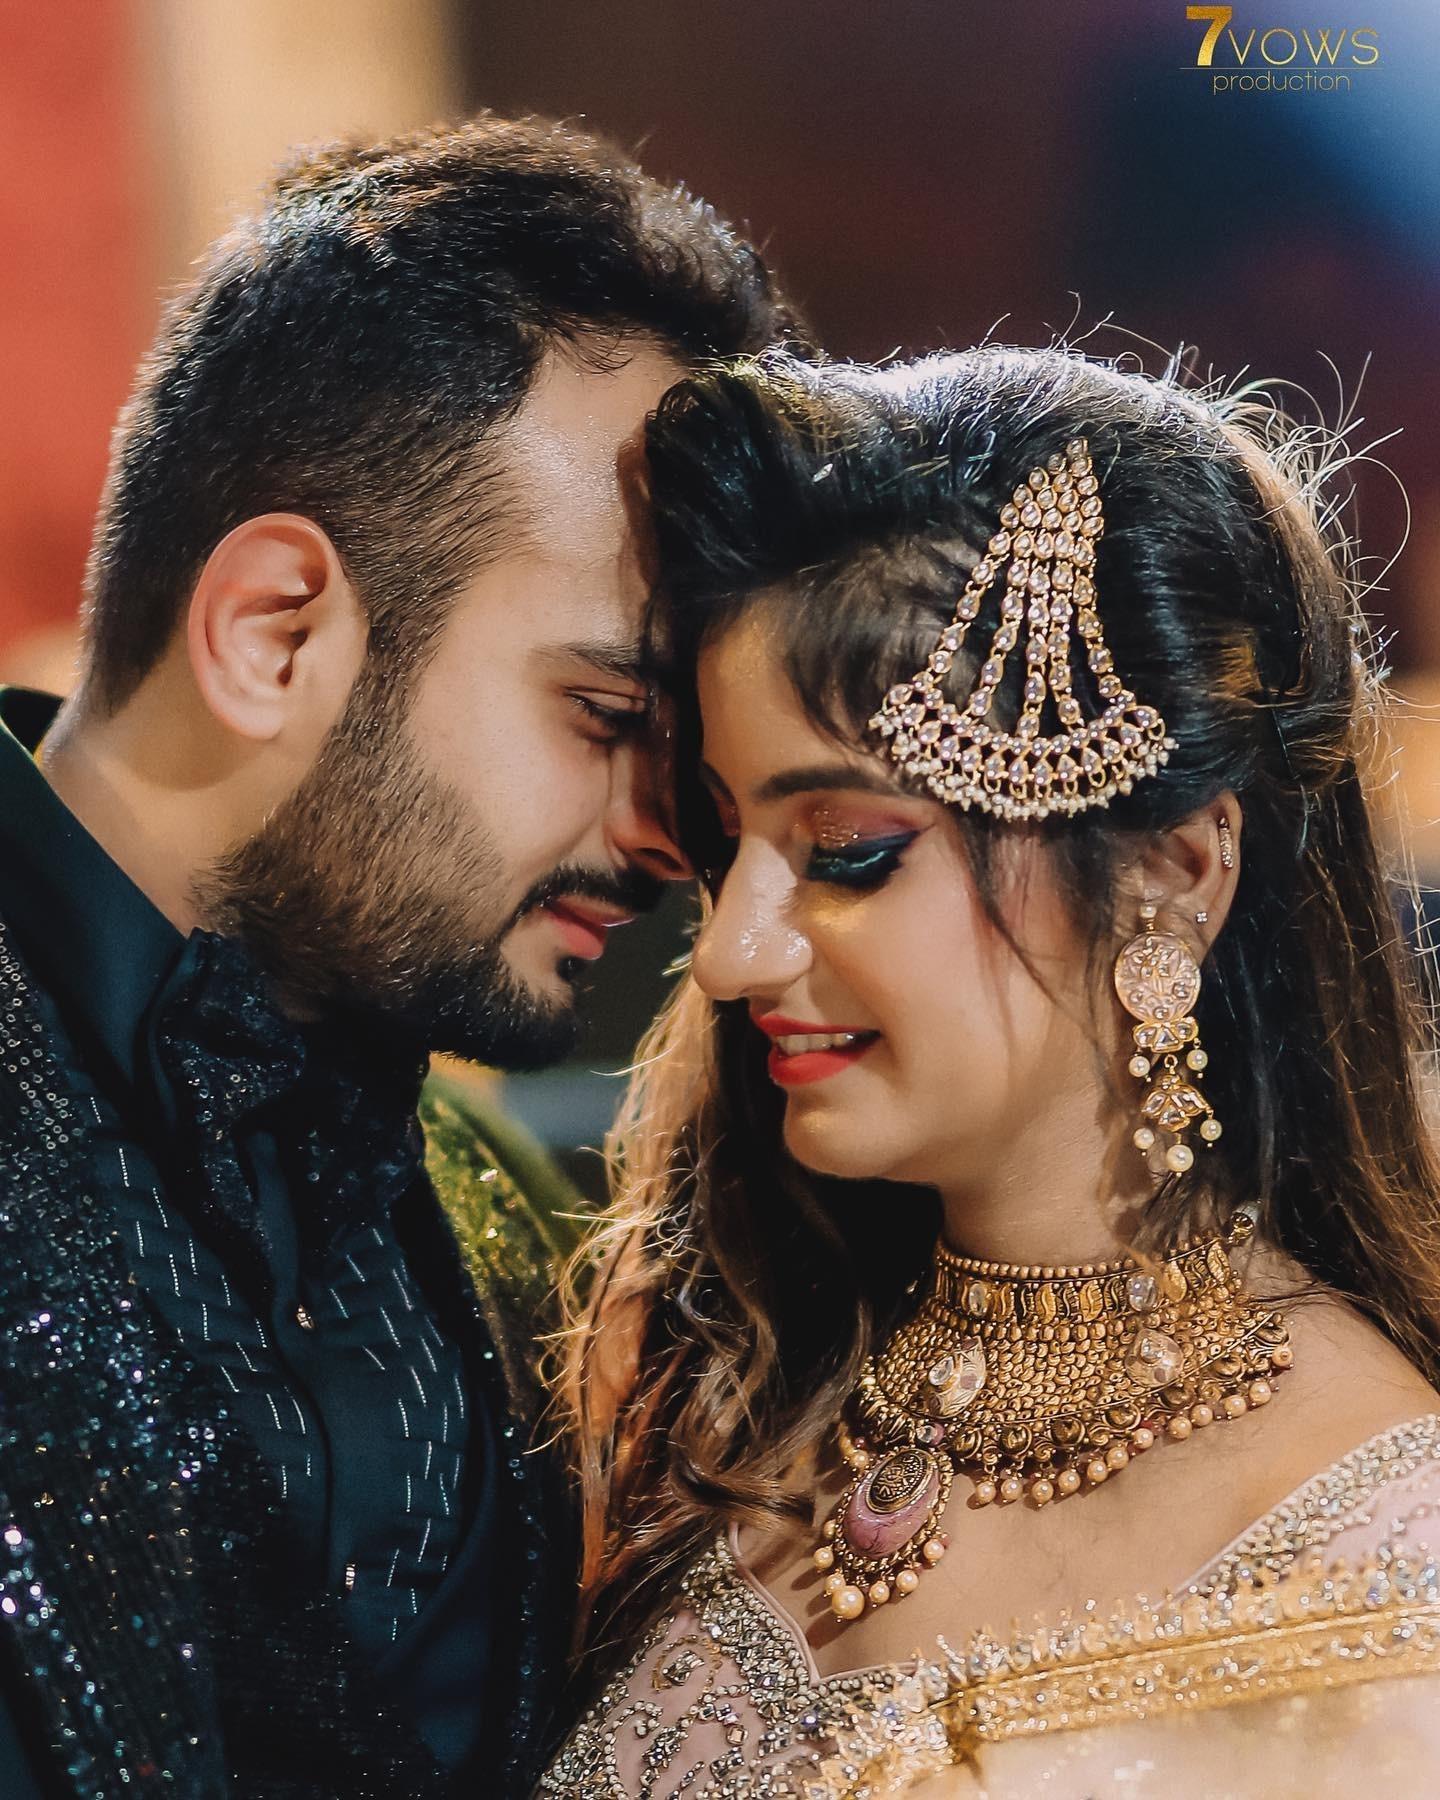 Indian Wedding Bride Groom - 7Vows Production